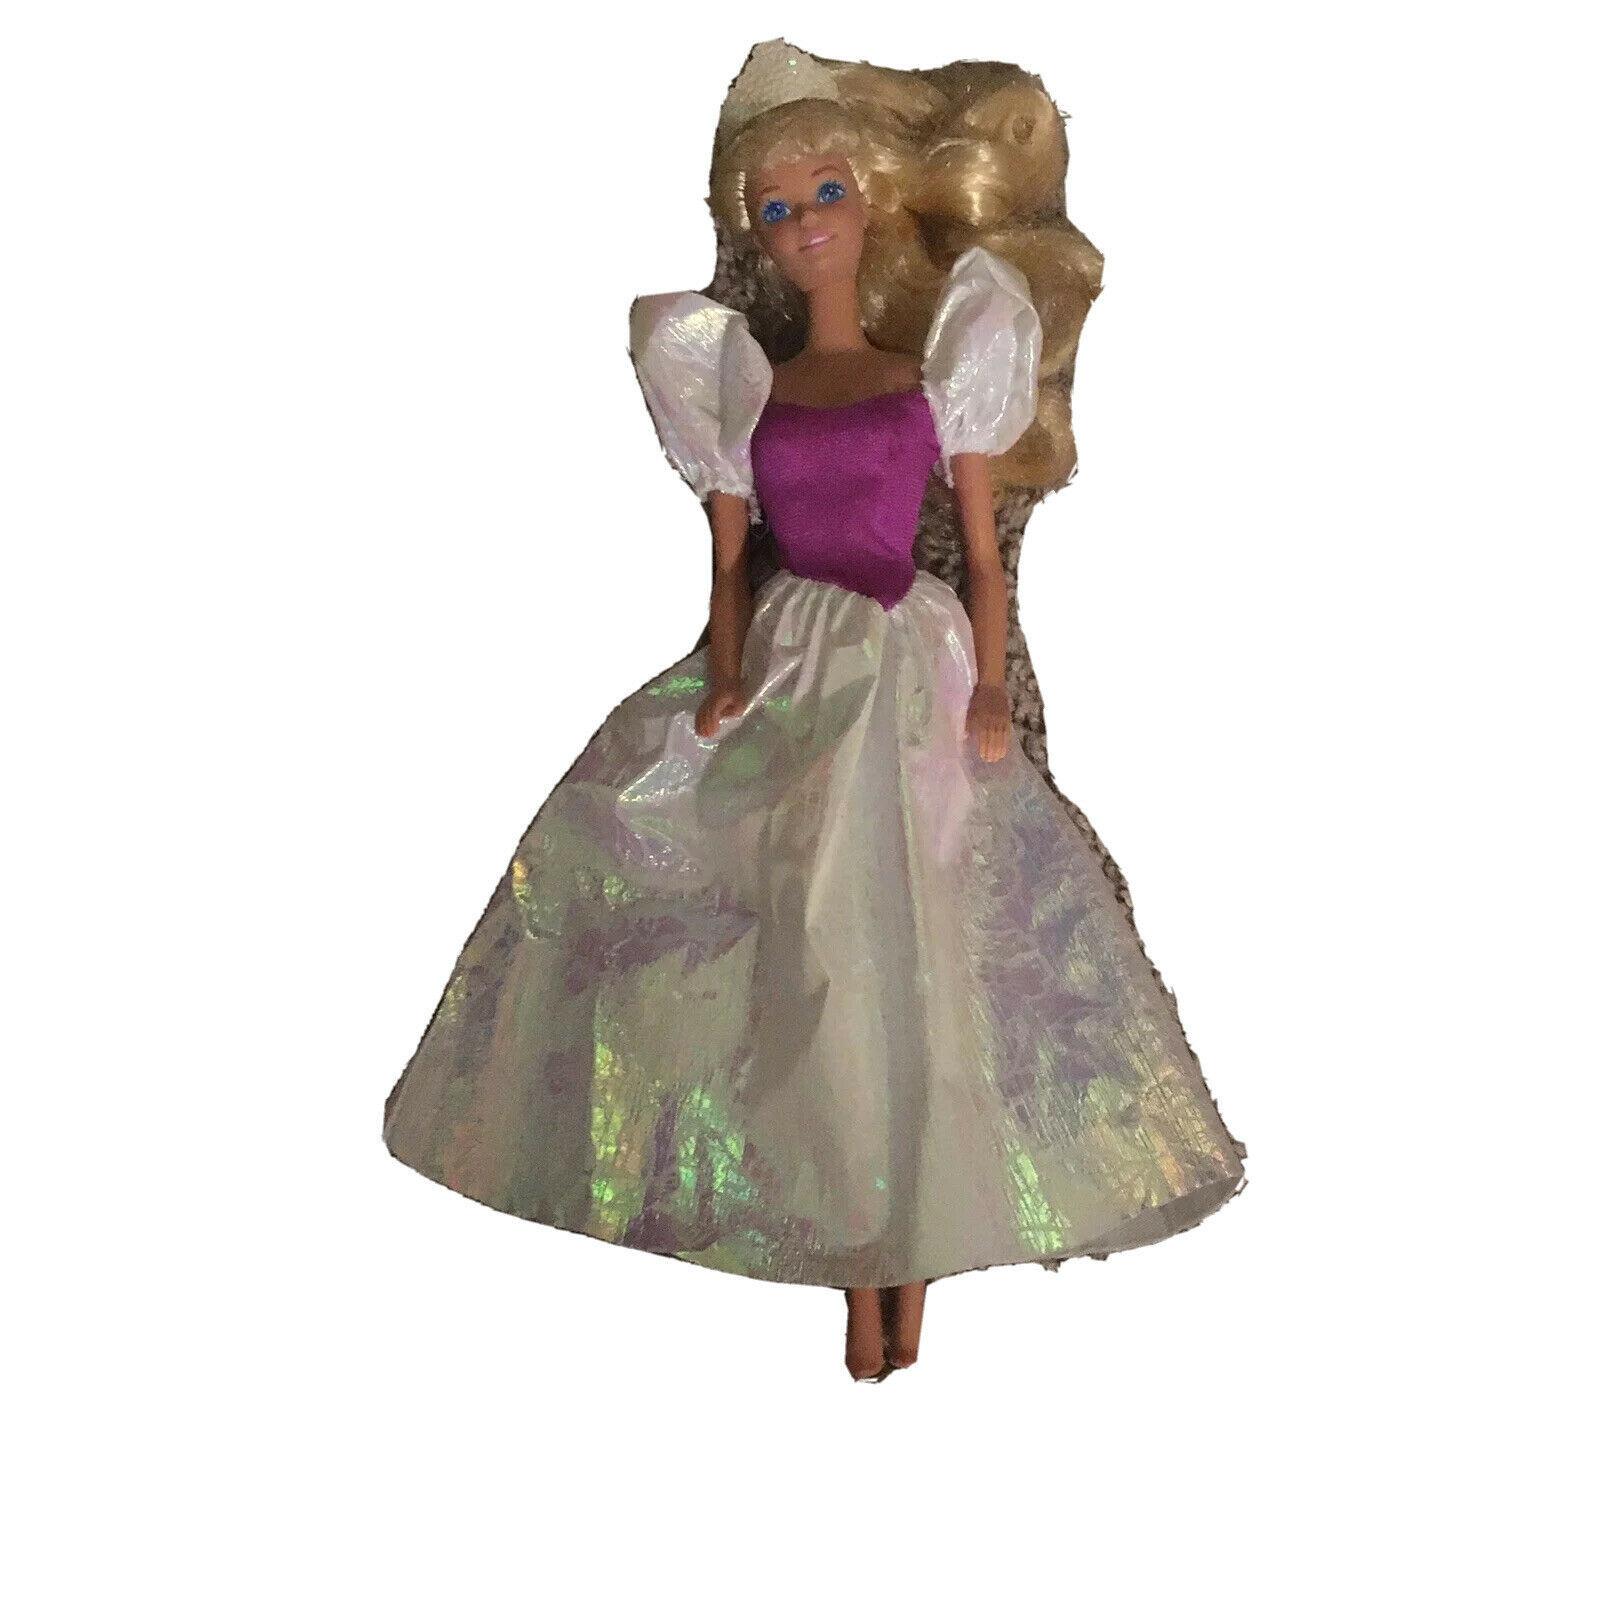 My First Barbie Doll Prettiest Princess Ever 1989 Mattel Vintage Irridecent - $11.13